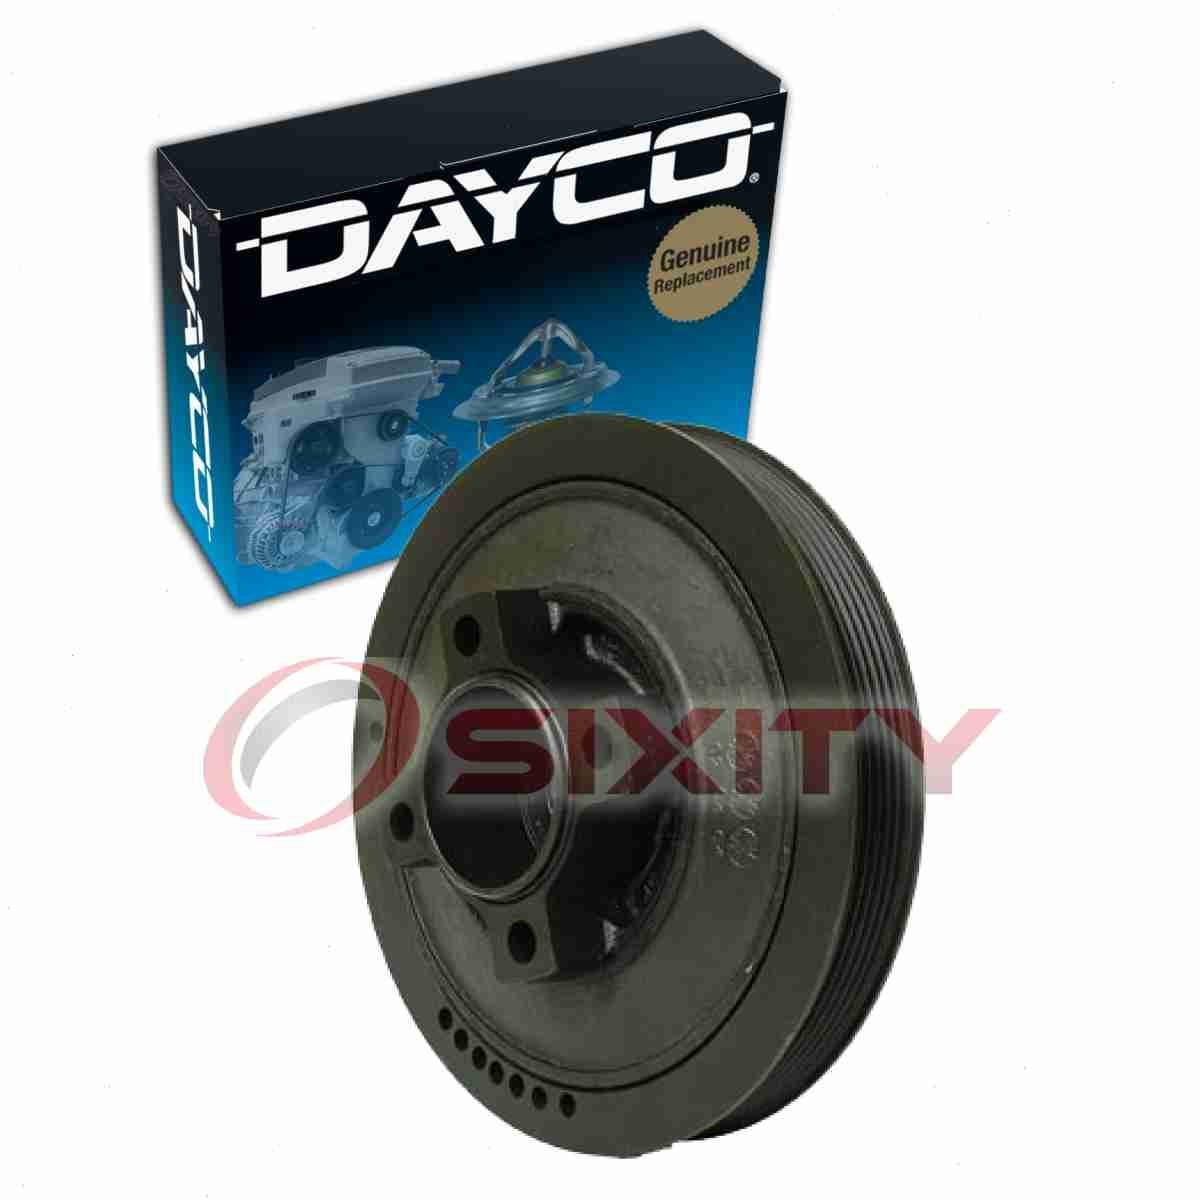 Dayco Harmonic Balancer For 1994-1996 Chevrolet G30 6.5L